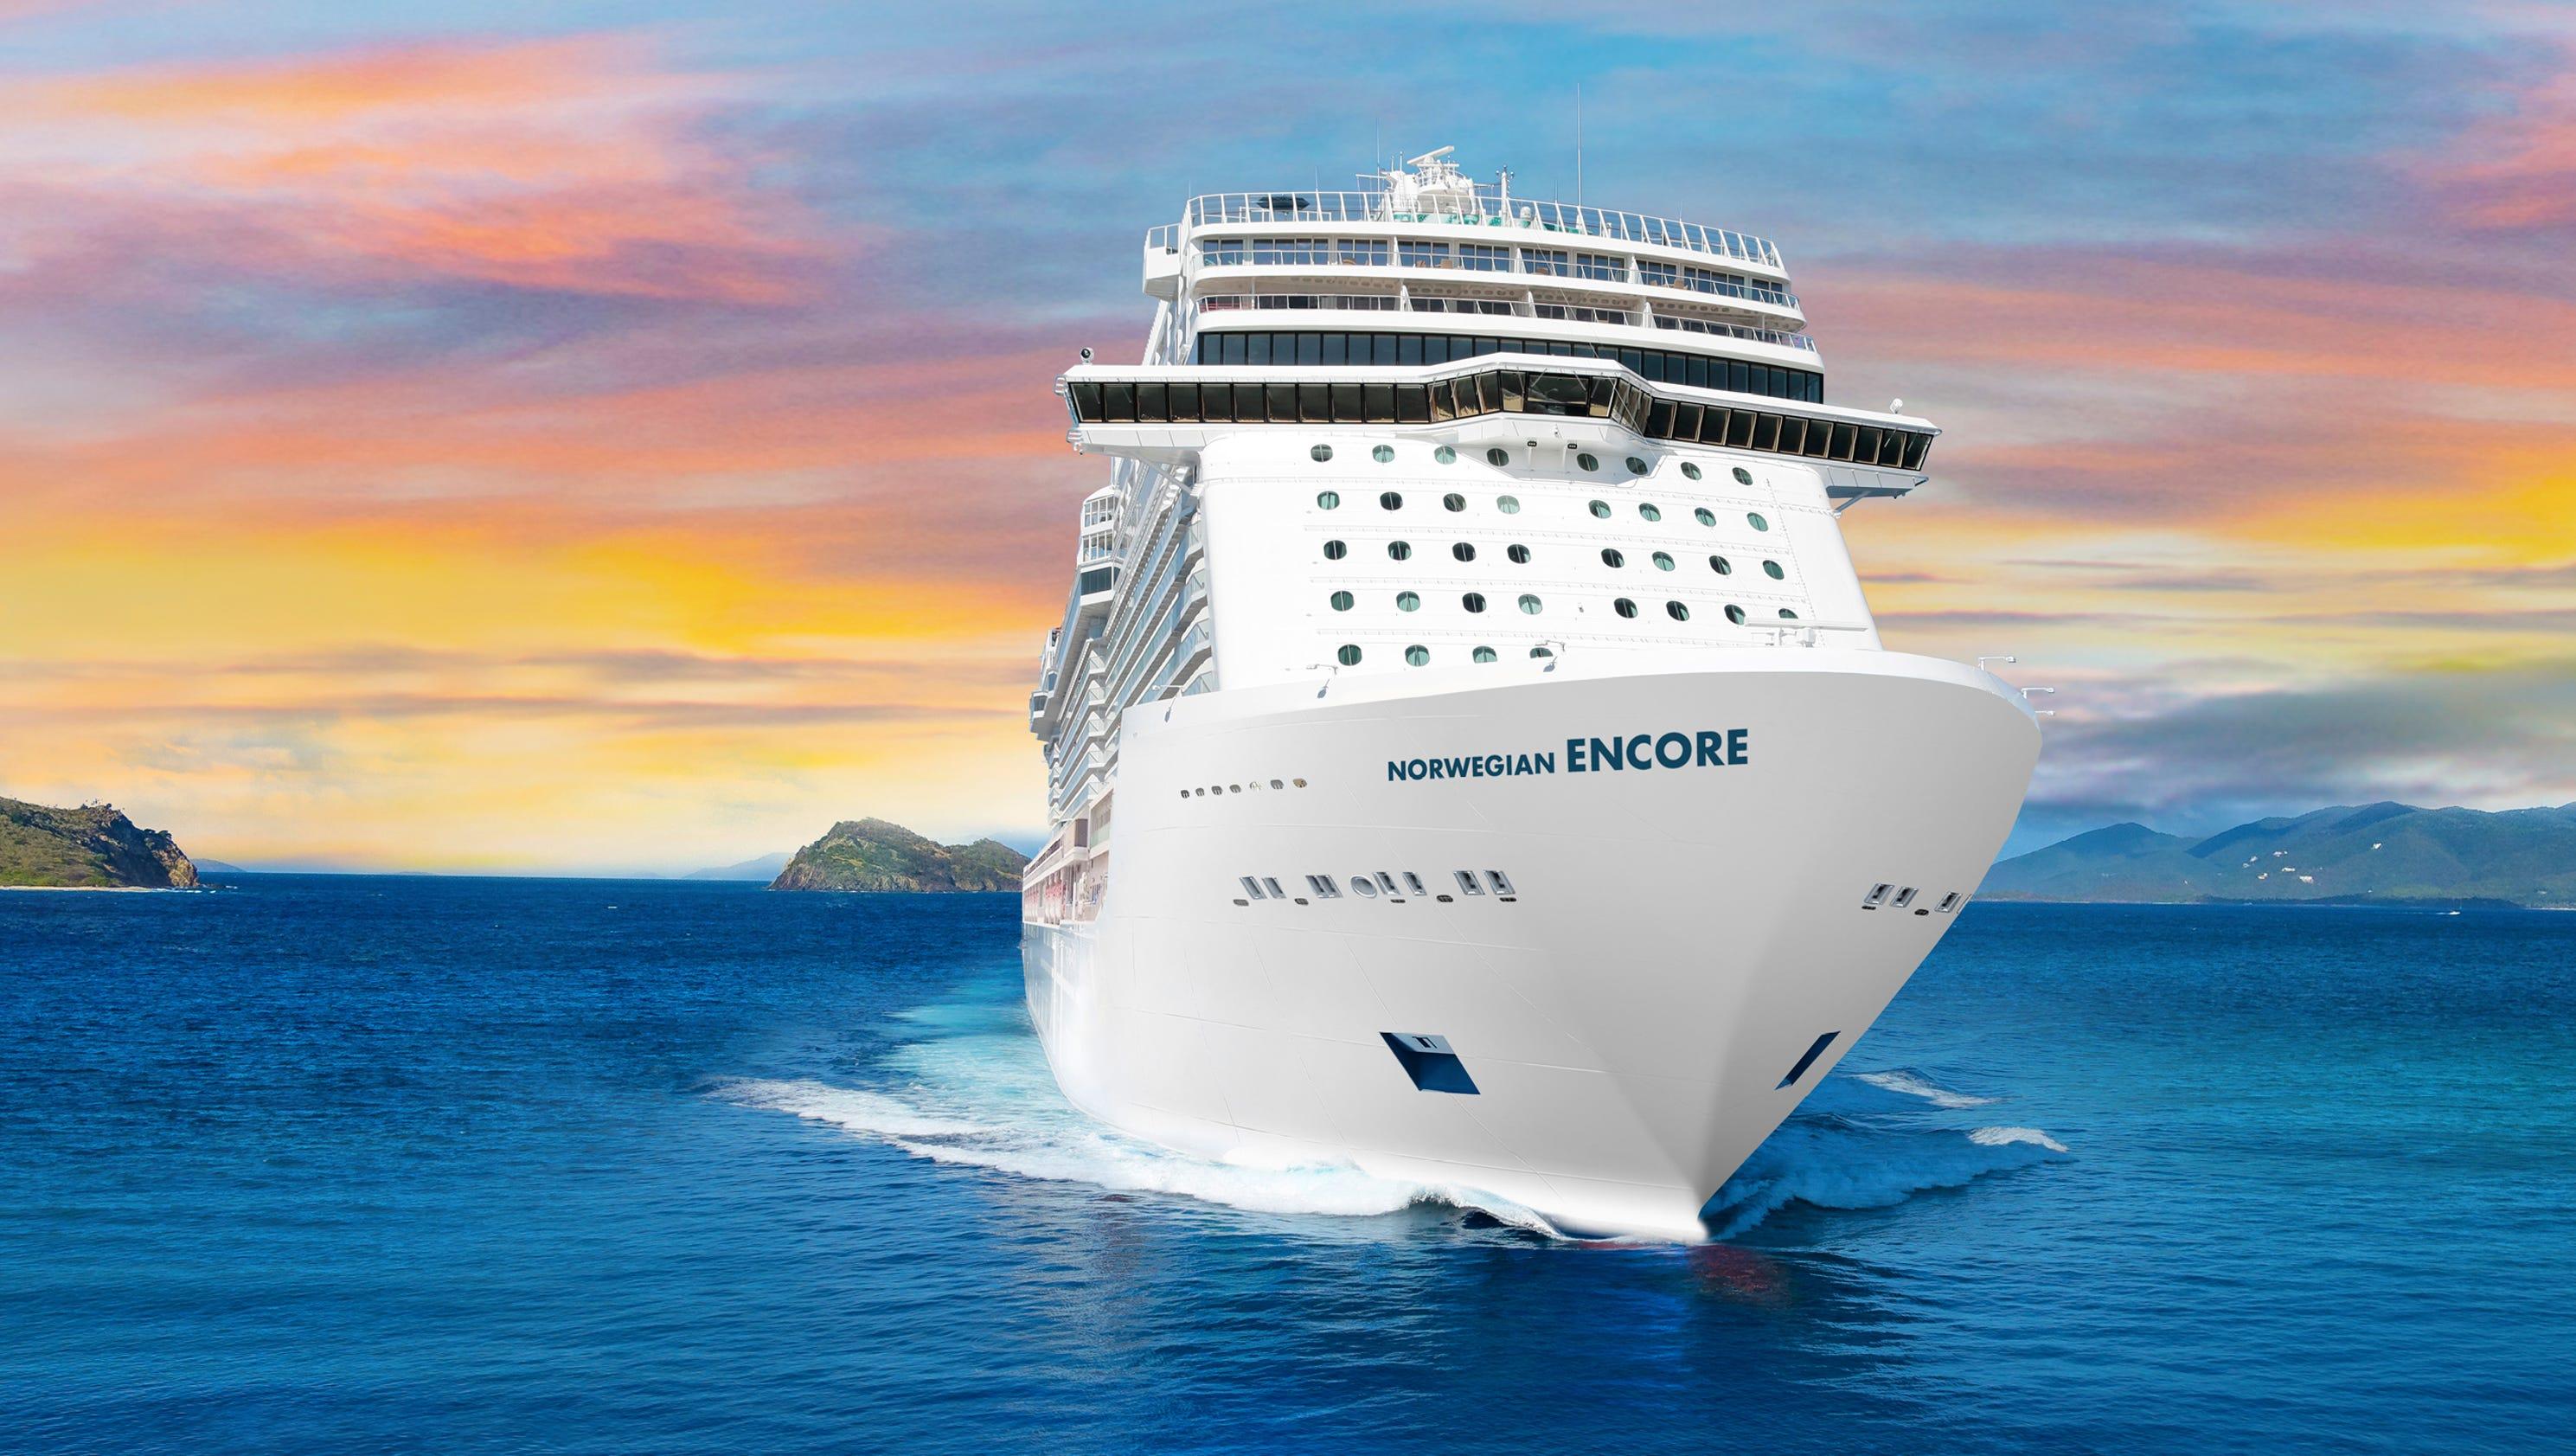 Norwegian Encore Giant Norwegian Cruise Line Ship To Sail